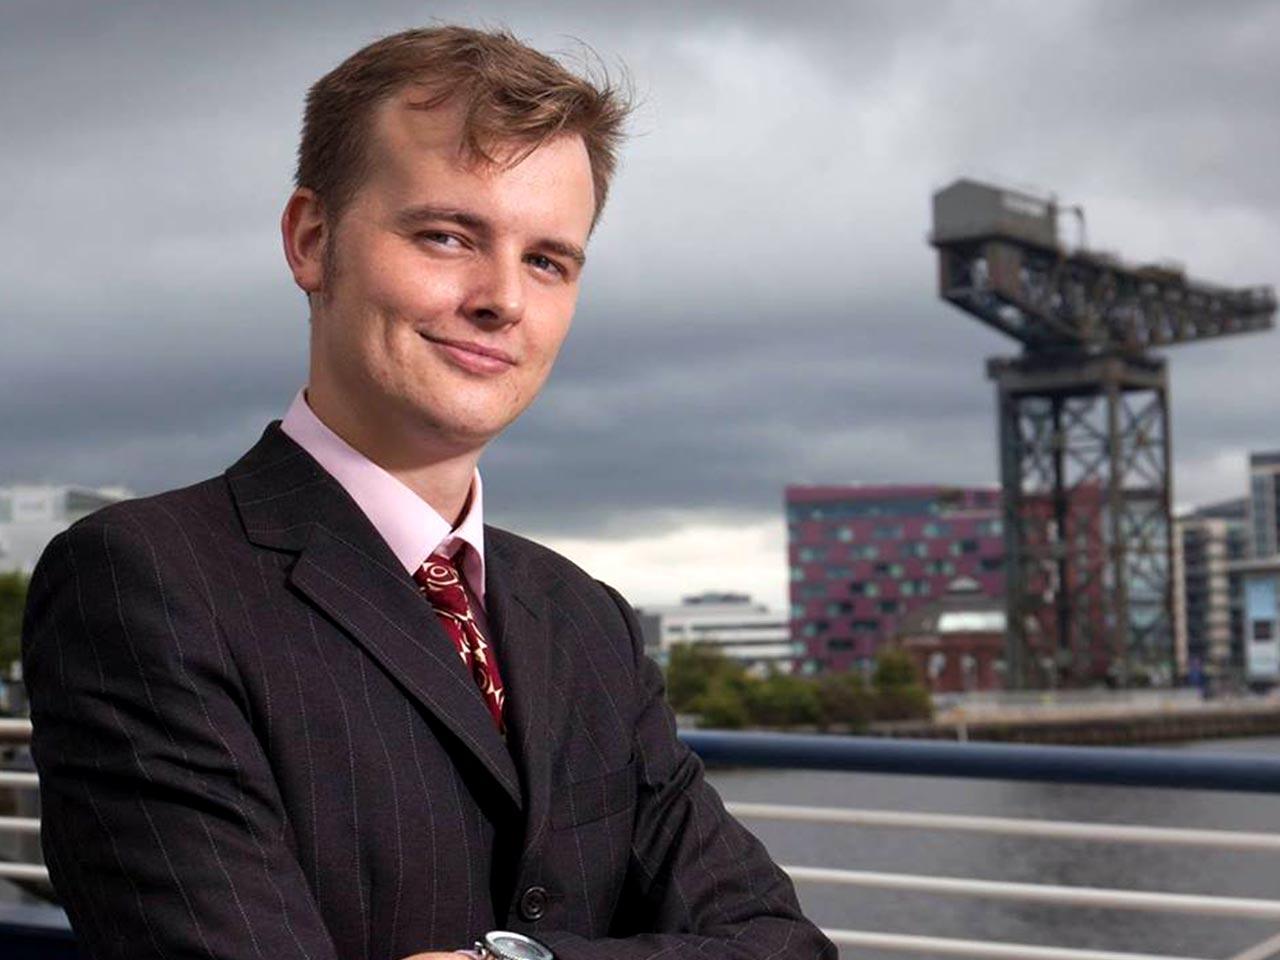 Mitch Hunter-Scullion - Fondateur et CEO, Asteroid Mining Corporation LTD.